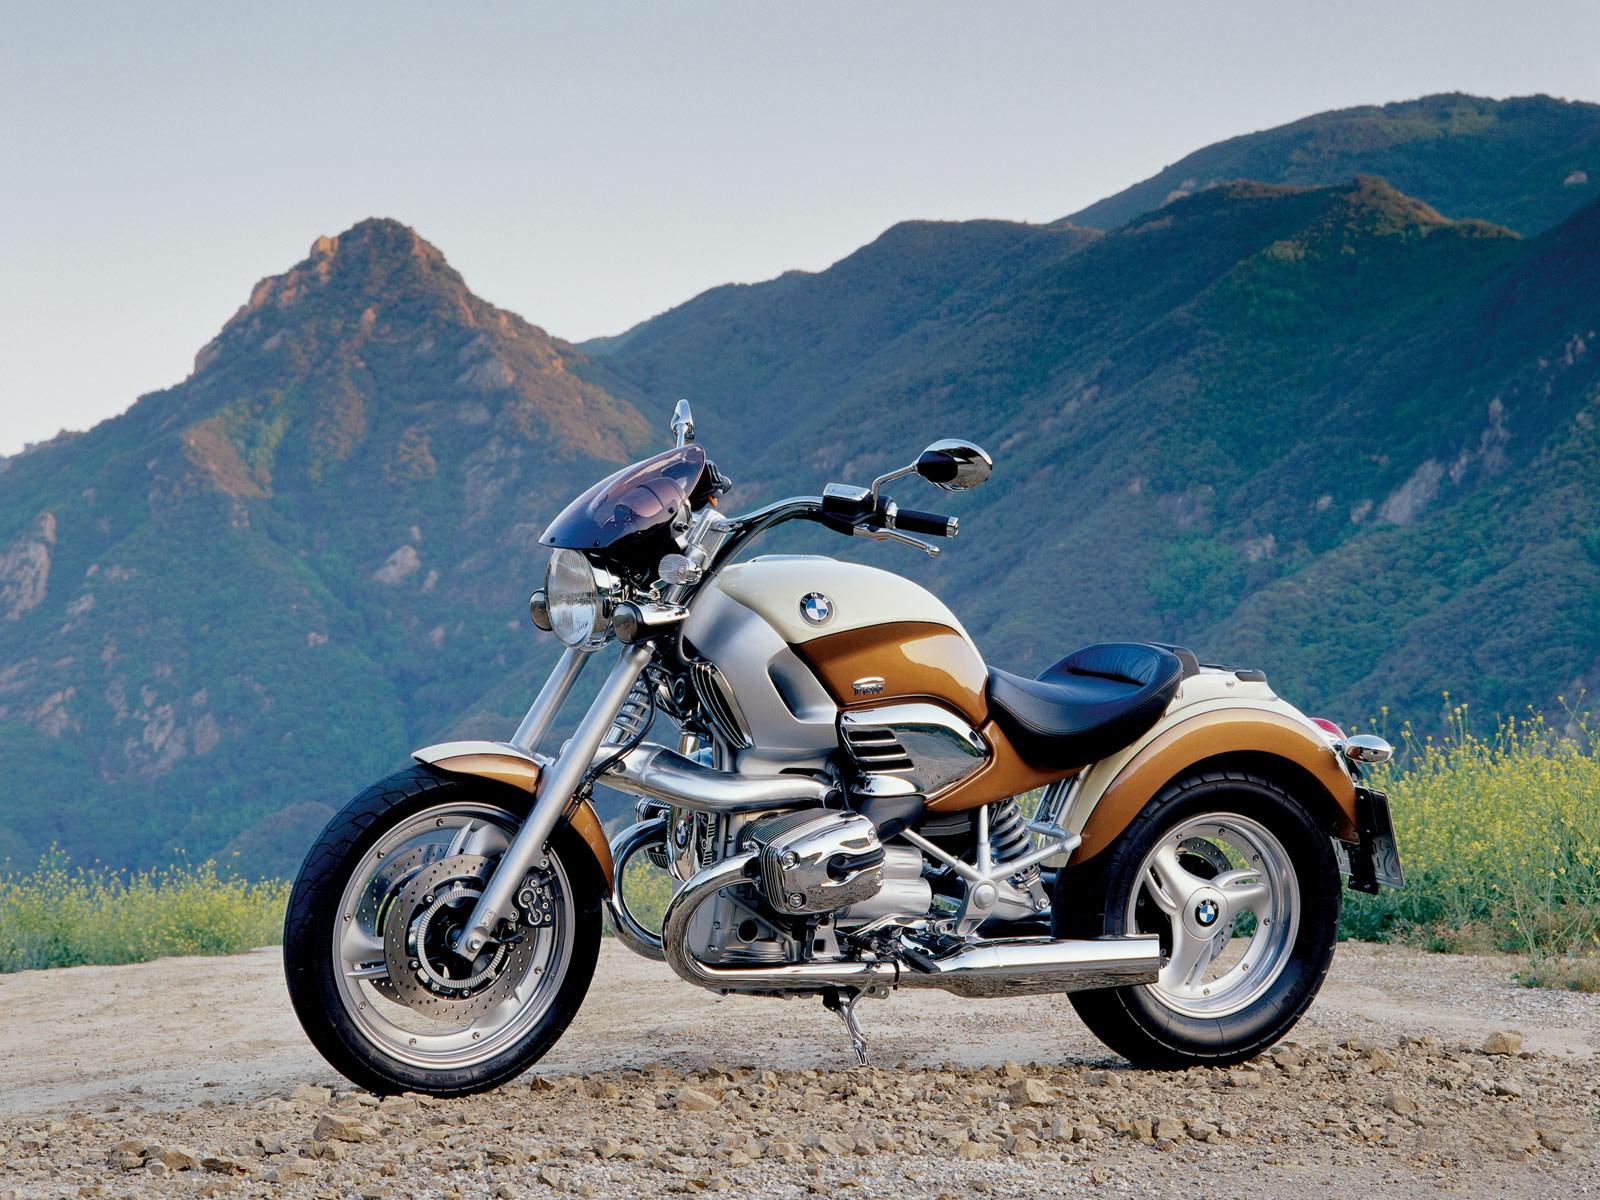 http://1.bp.blogspot.com/_St8PvhYLC4c/TVPLPU3ukfI/AAAAAAAADe8/xryocaSXXOw/s1600/2000_BMW_R1200C_Independence_2.jpg